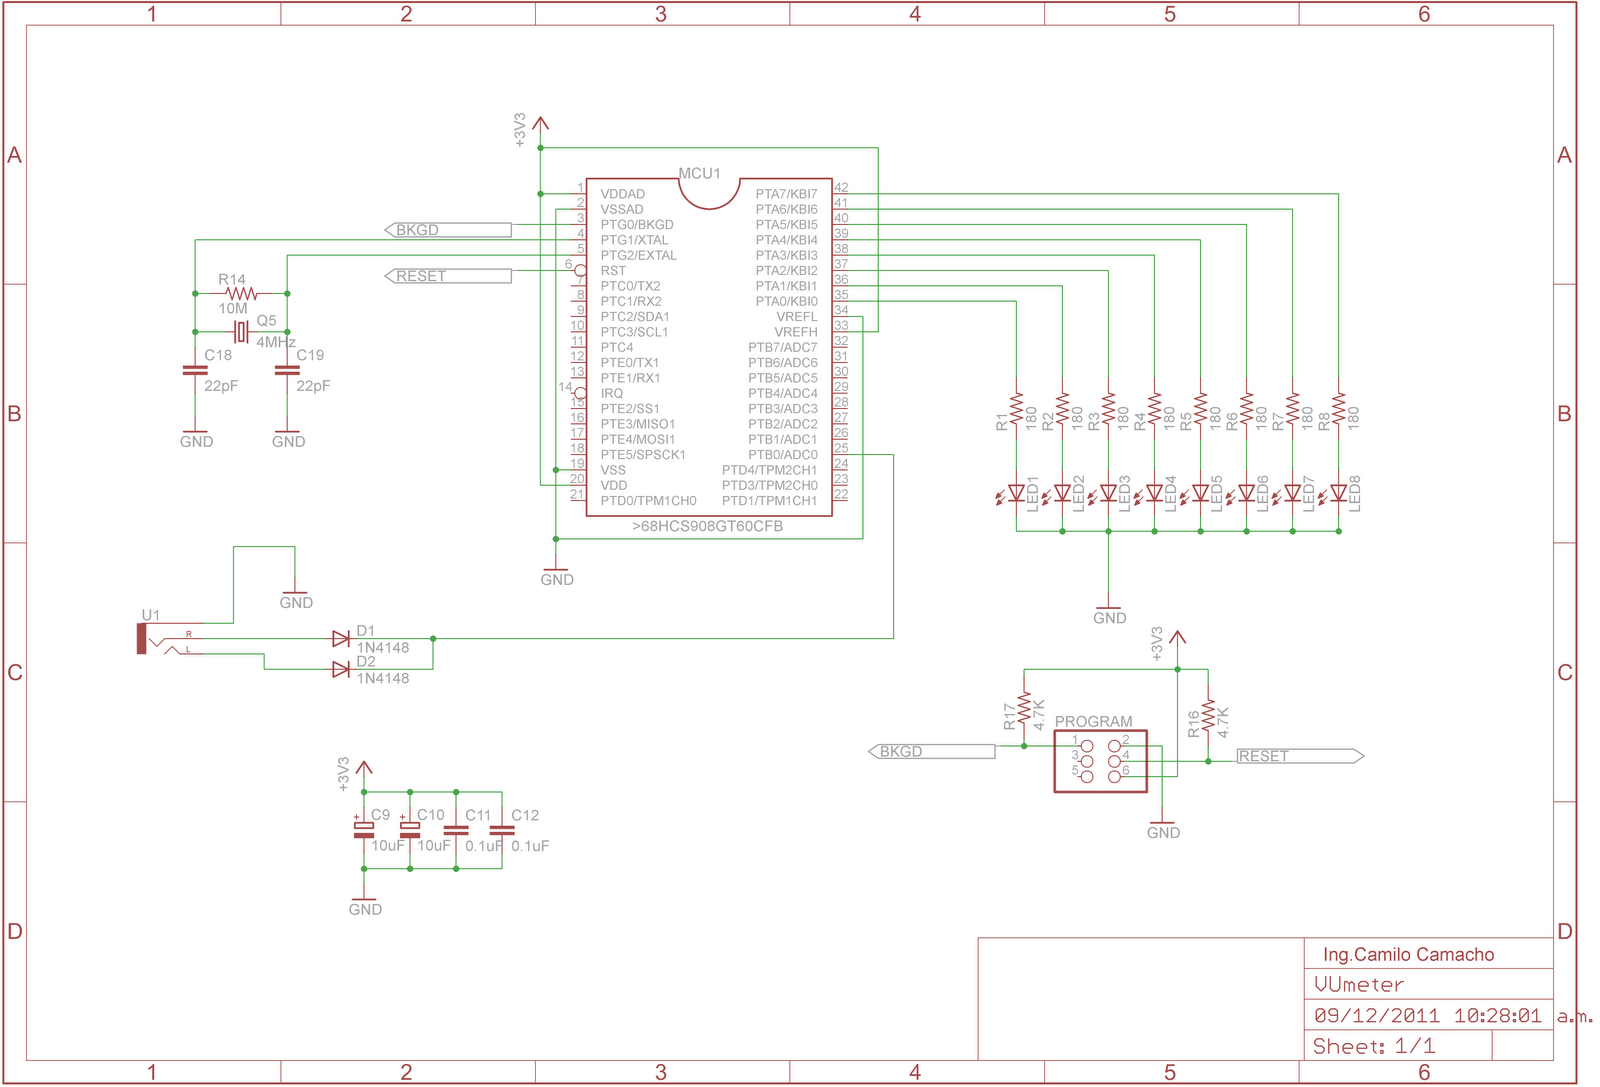 Candelectronica Led Vu Meter En Un Hcs08 De Freescale